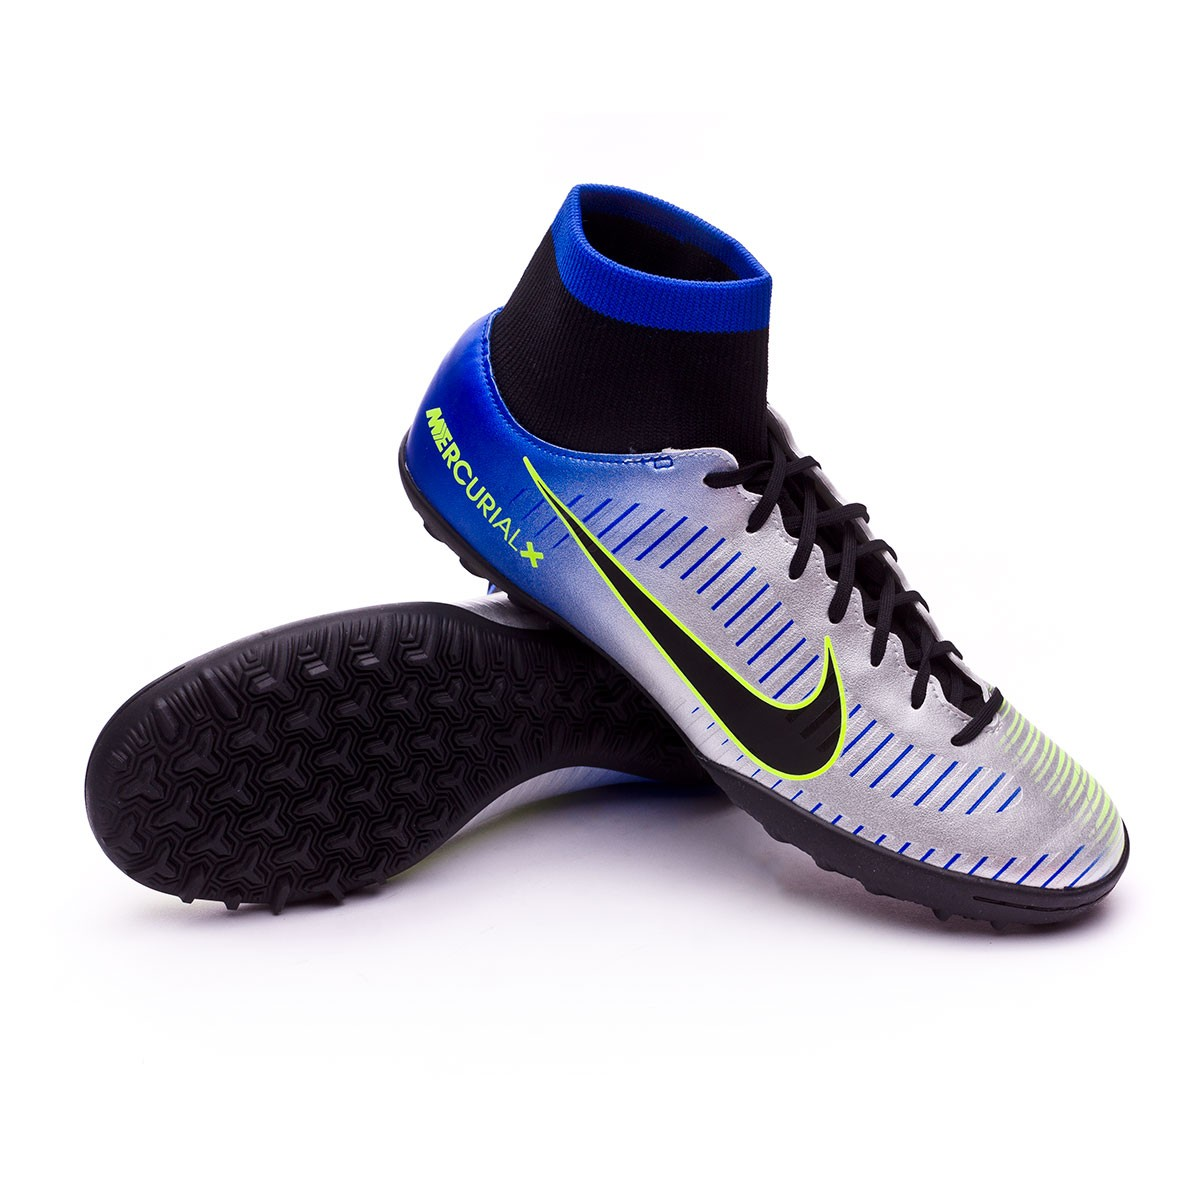 f1aba80f568 Football Boot Nike MercurialX Victory VI DF Turf Neymar Racer blue ...